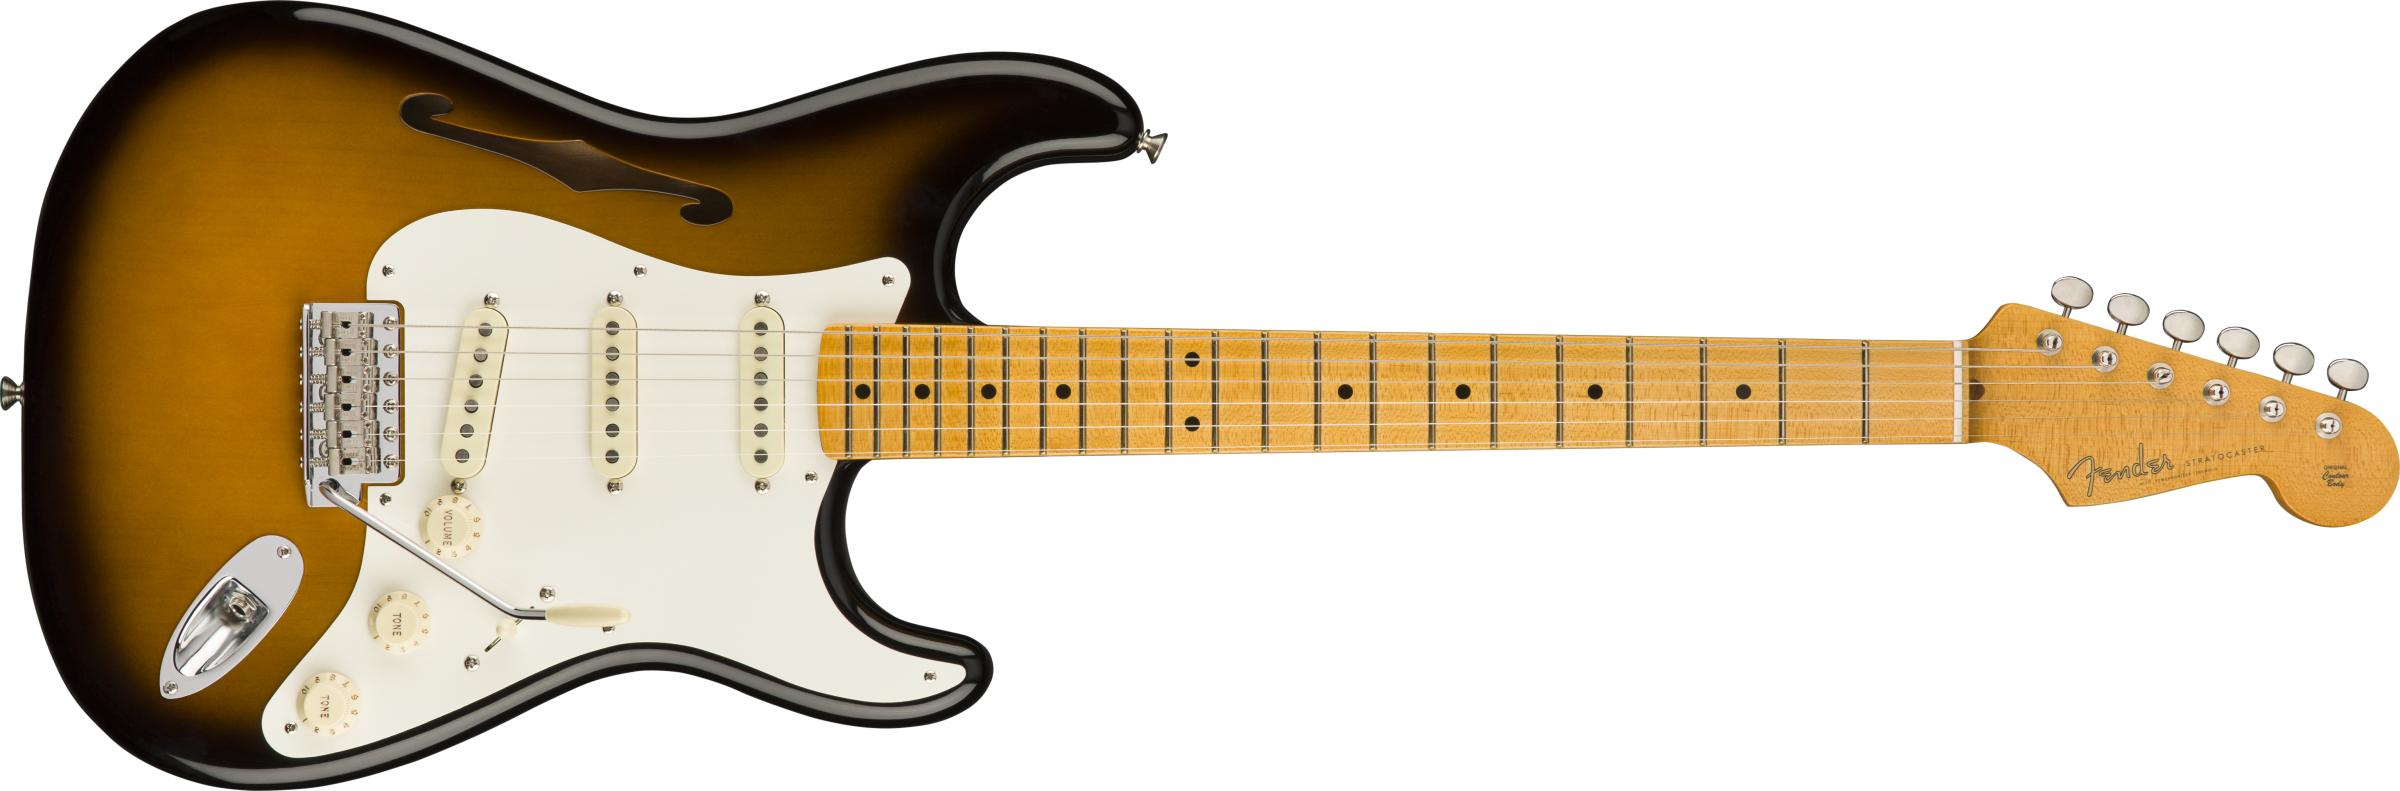 FENDER-Eric-Johnson-Thinline-Stratocaster-Maple-Fingerboard-2-Color-Sunburst-sku-550011851